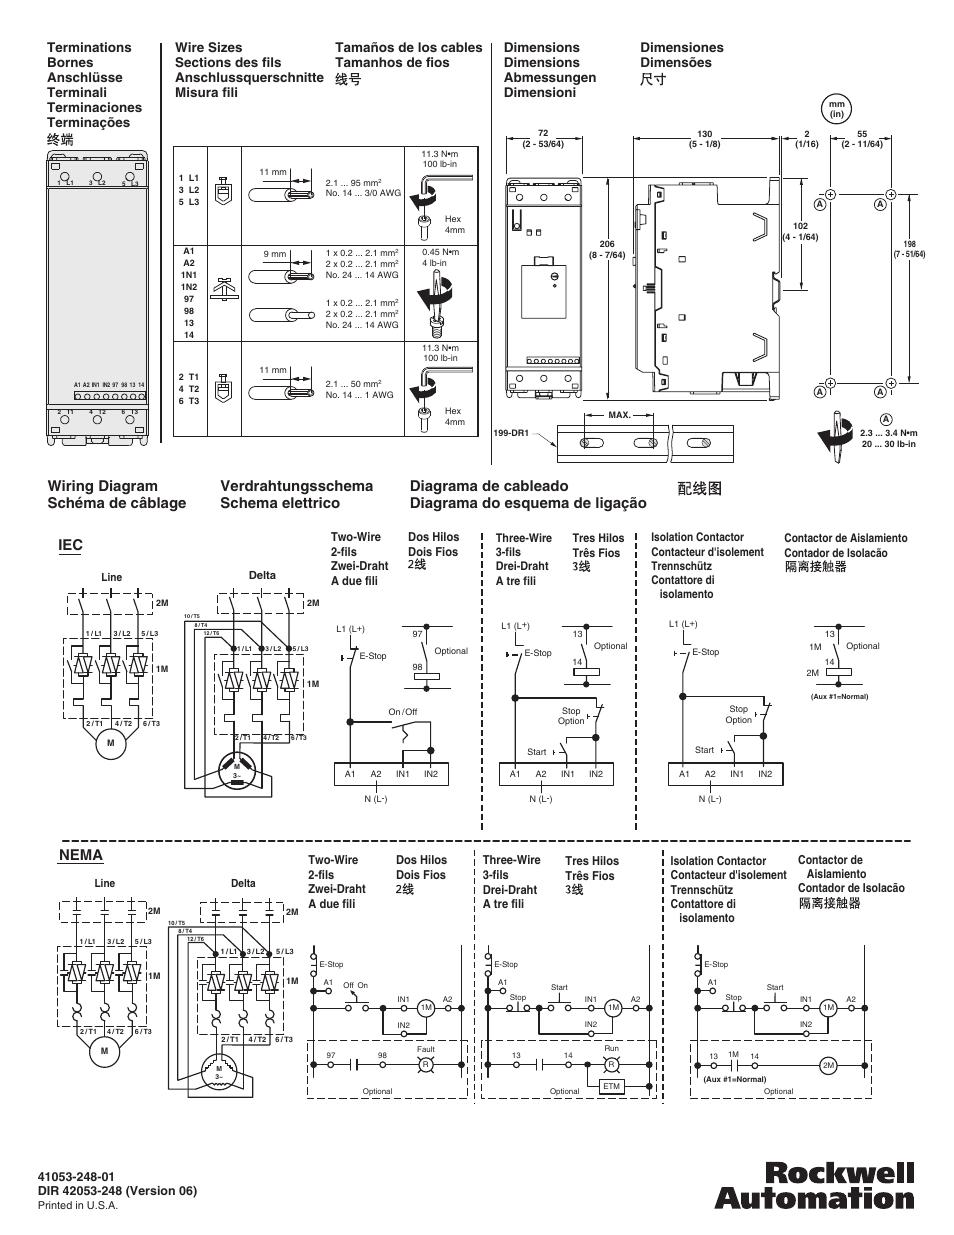 dip switch settings